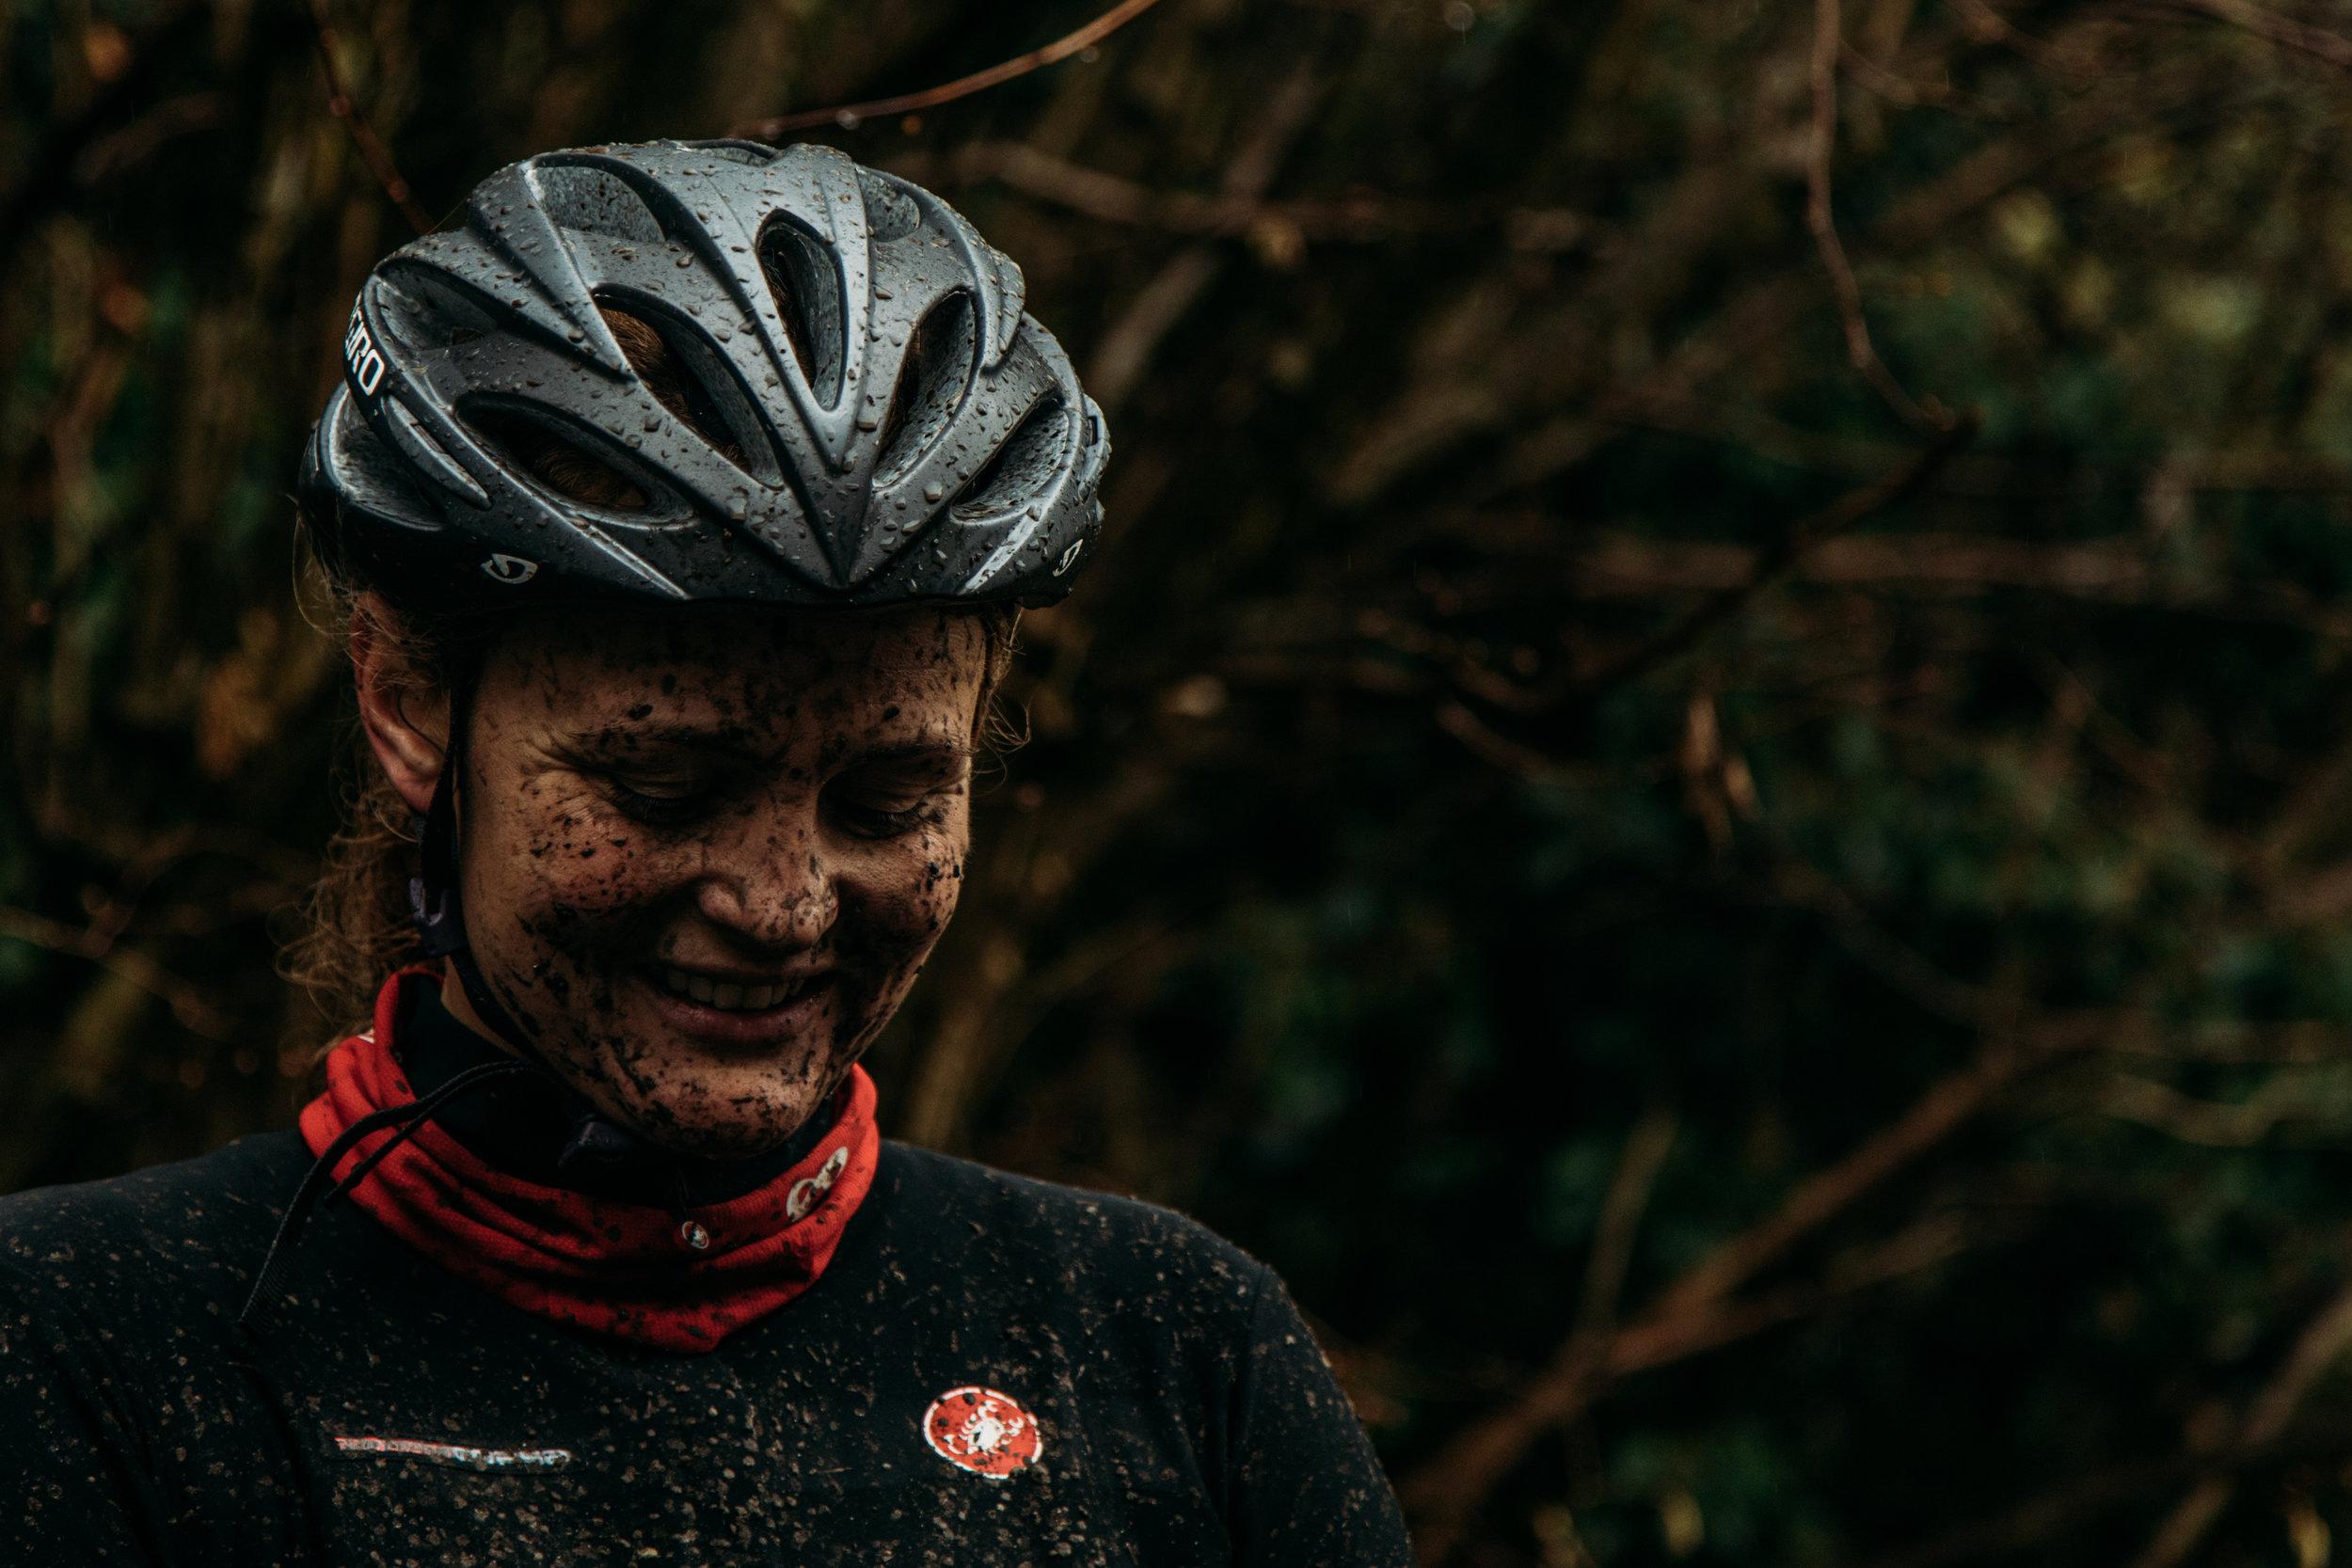 Muddy but happy